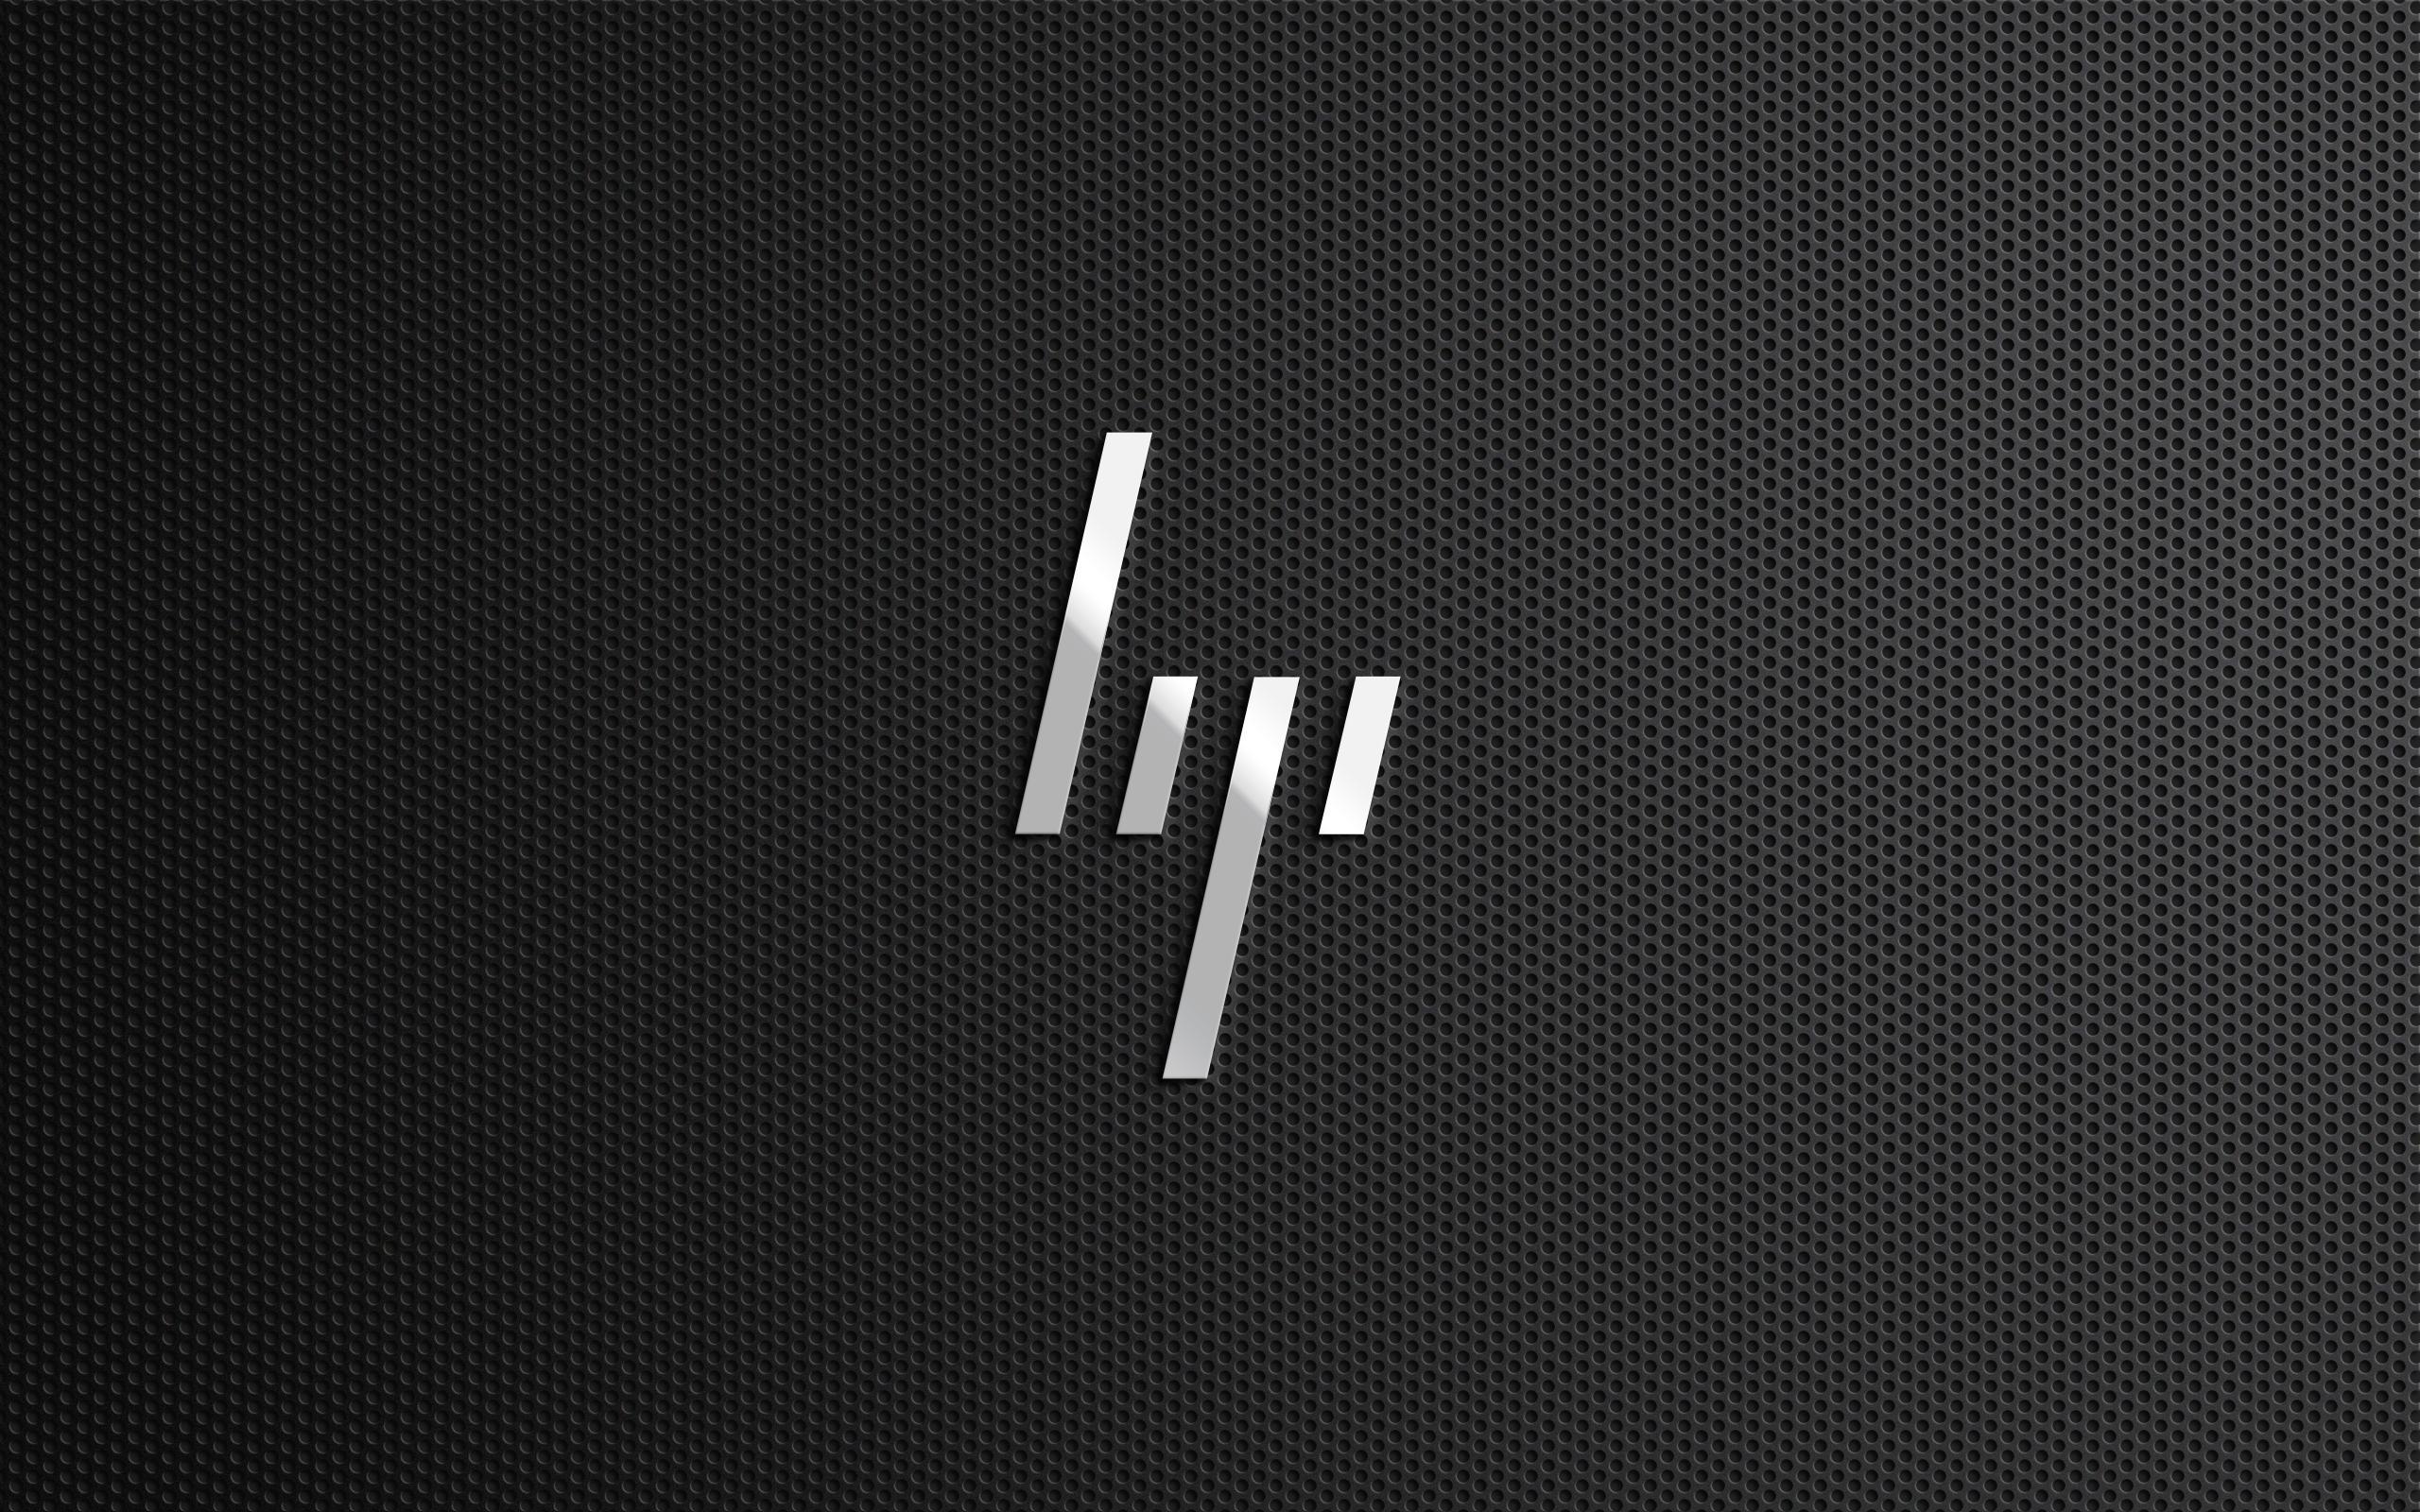 HP Logo Wallpapers   Top HP Logo Backgrounds   WallpaperAccess 2560x1600